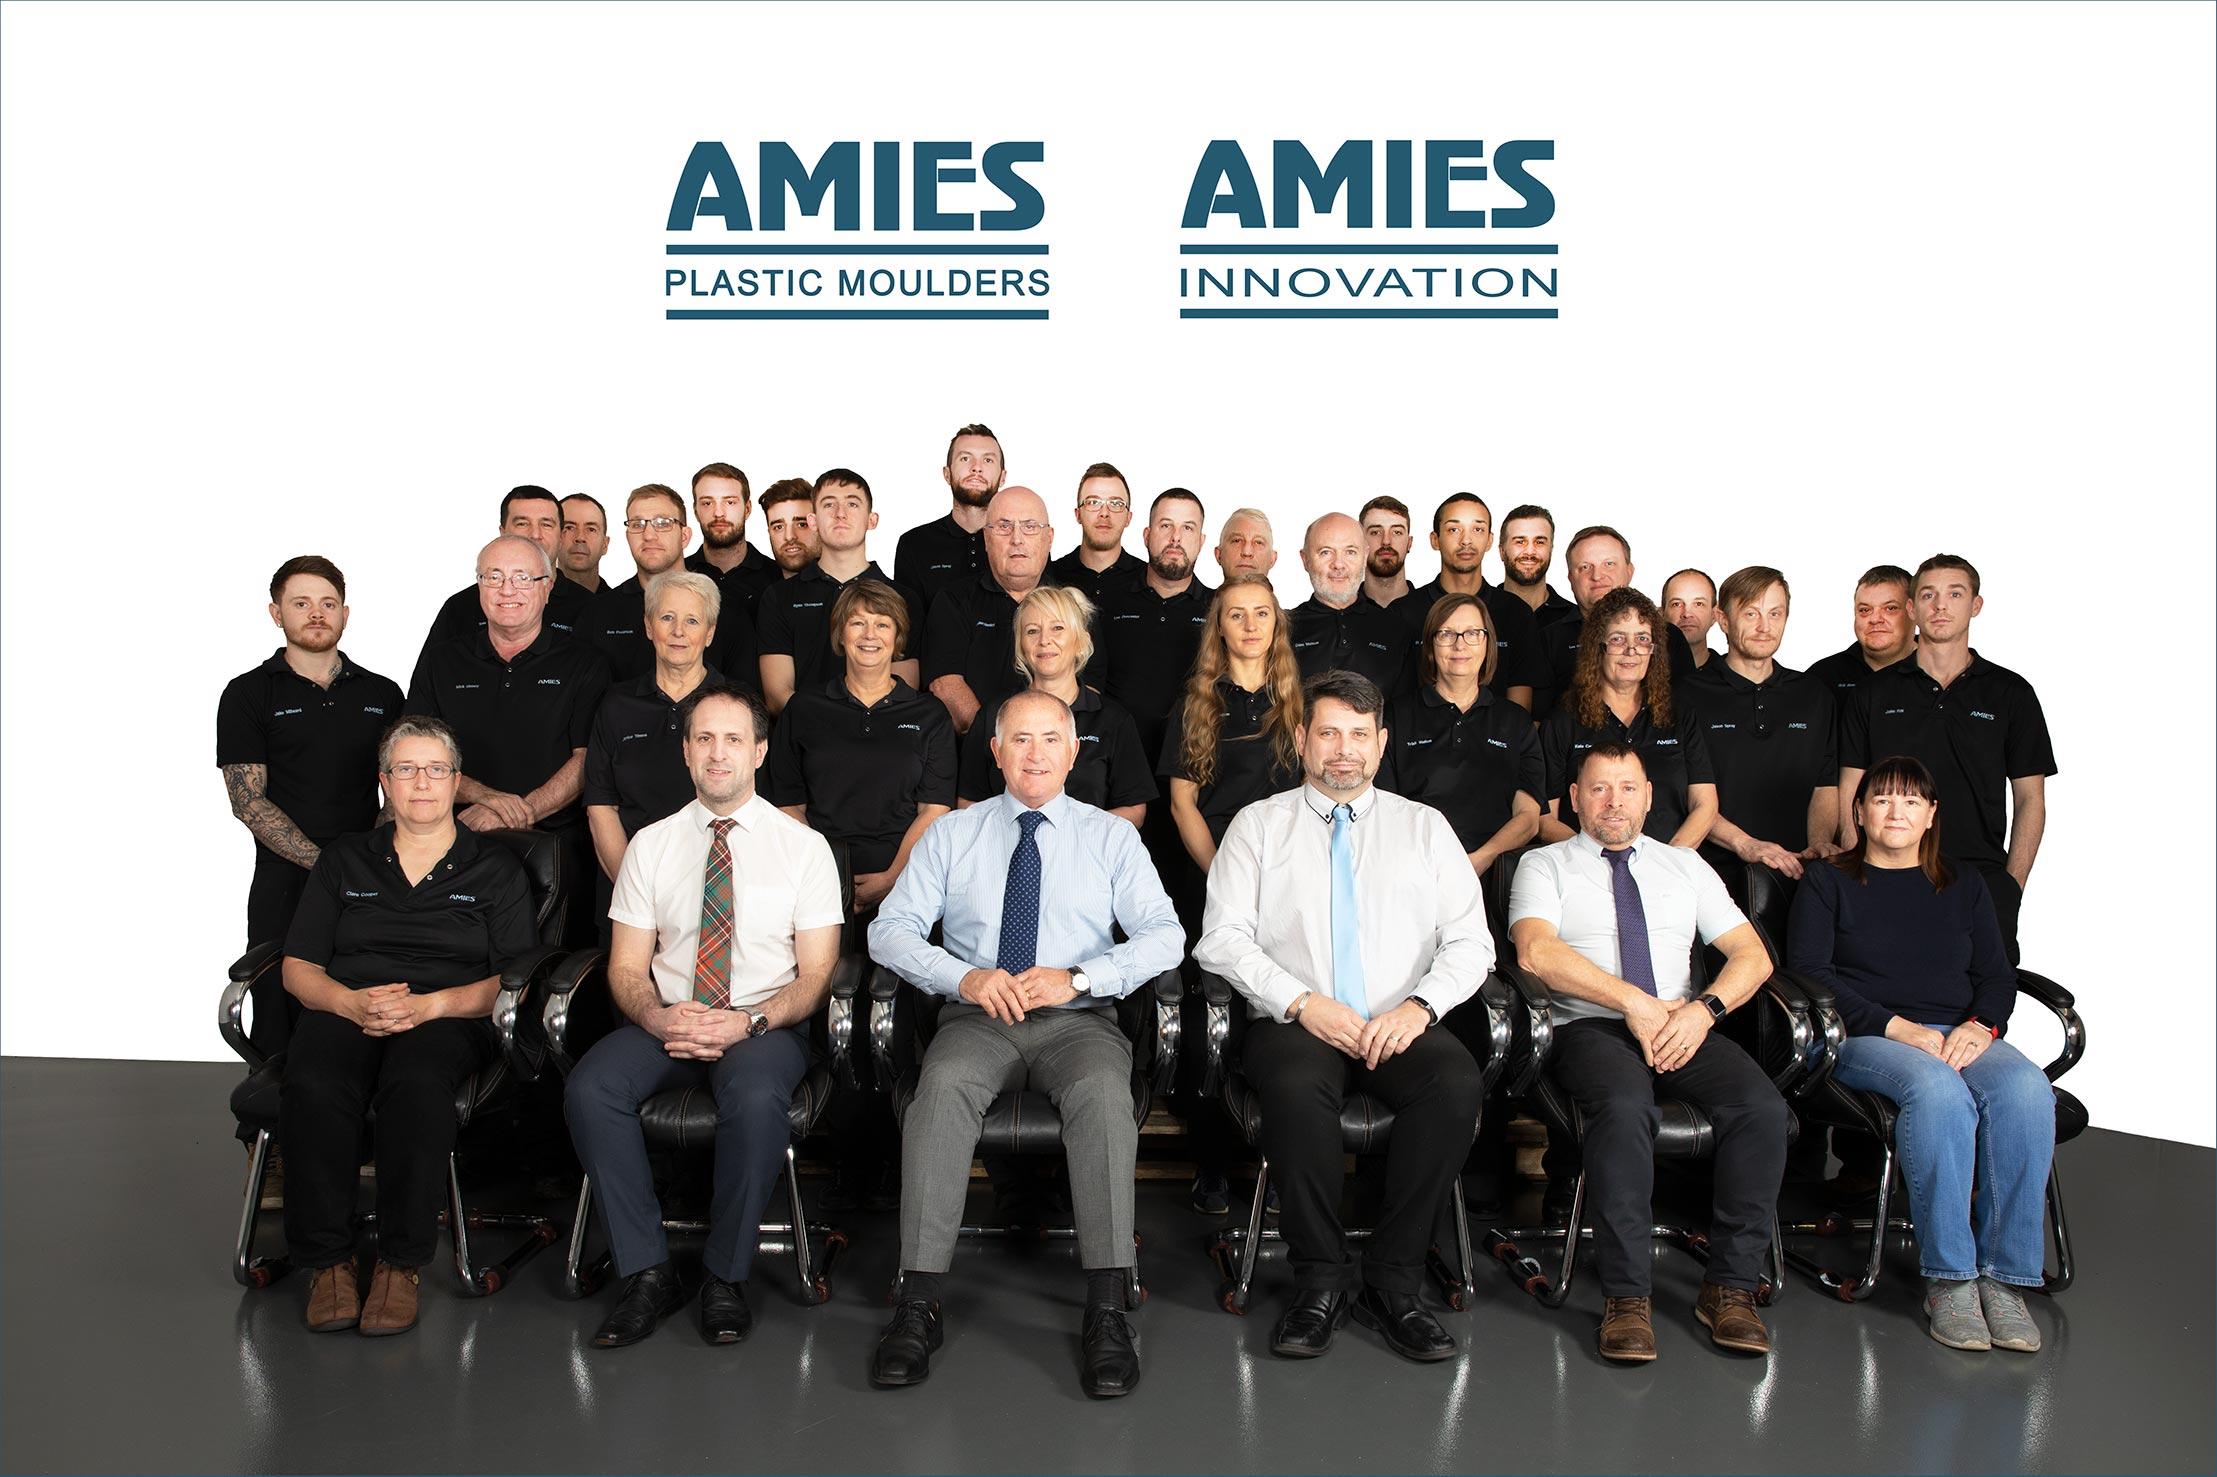 Amies Innovation-Team Photo